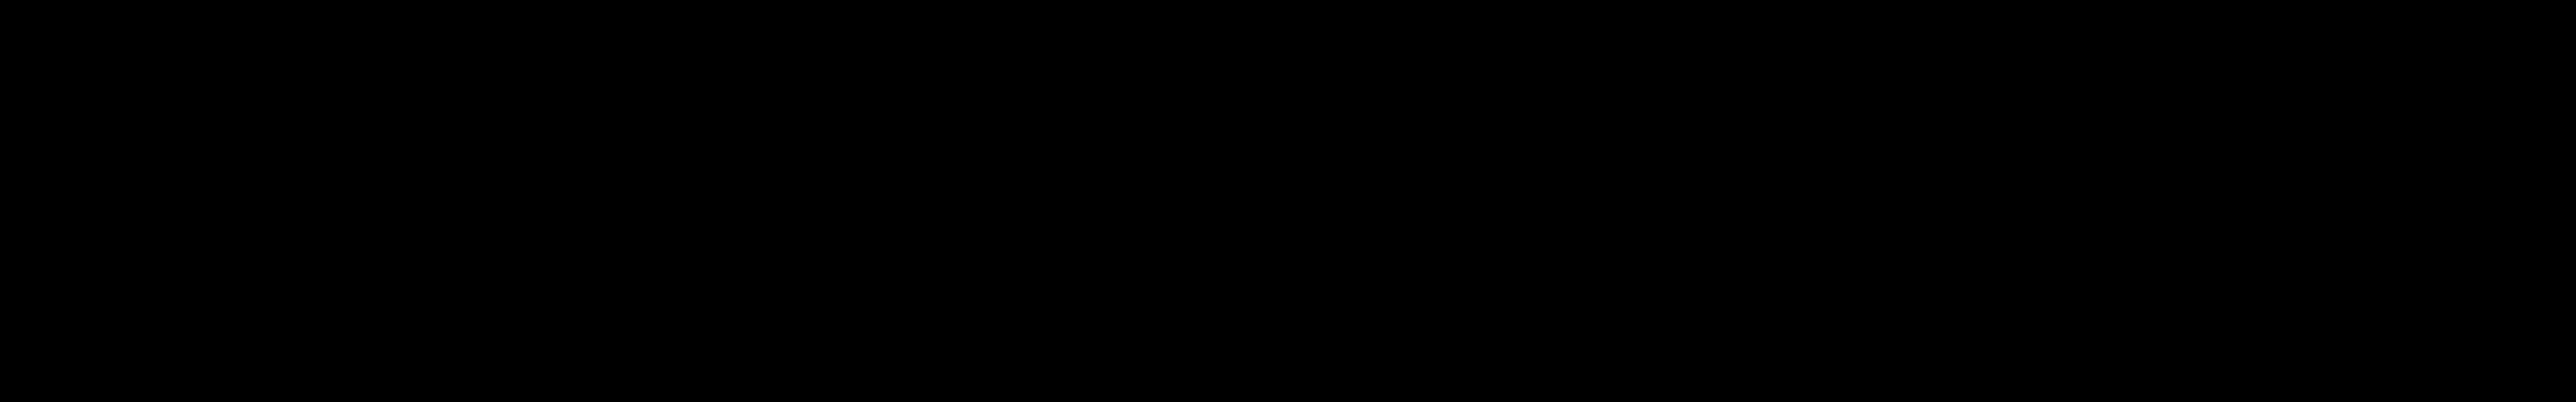 Klosmic